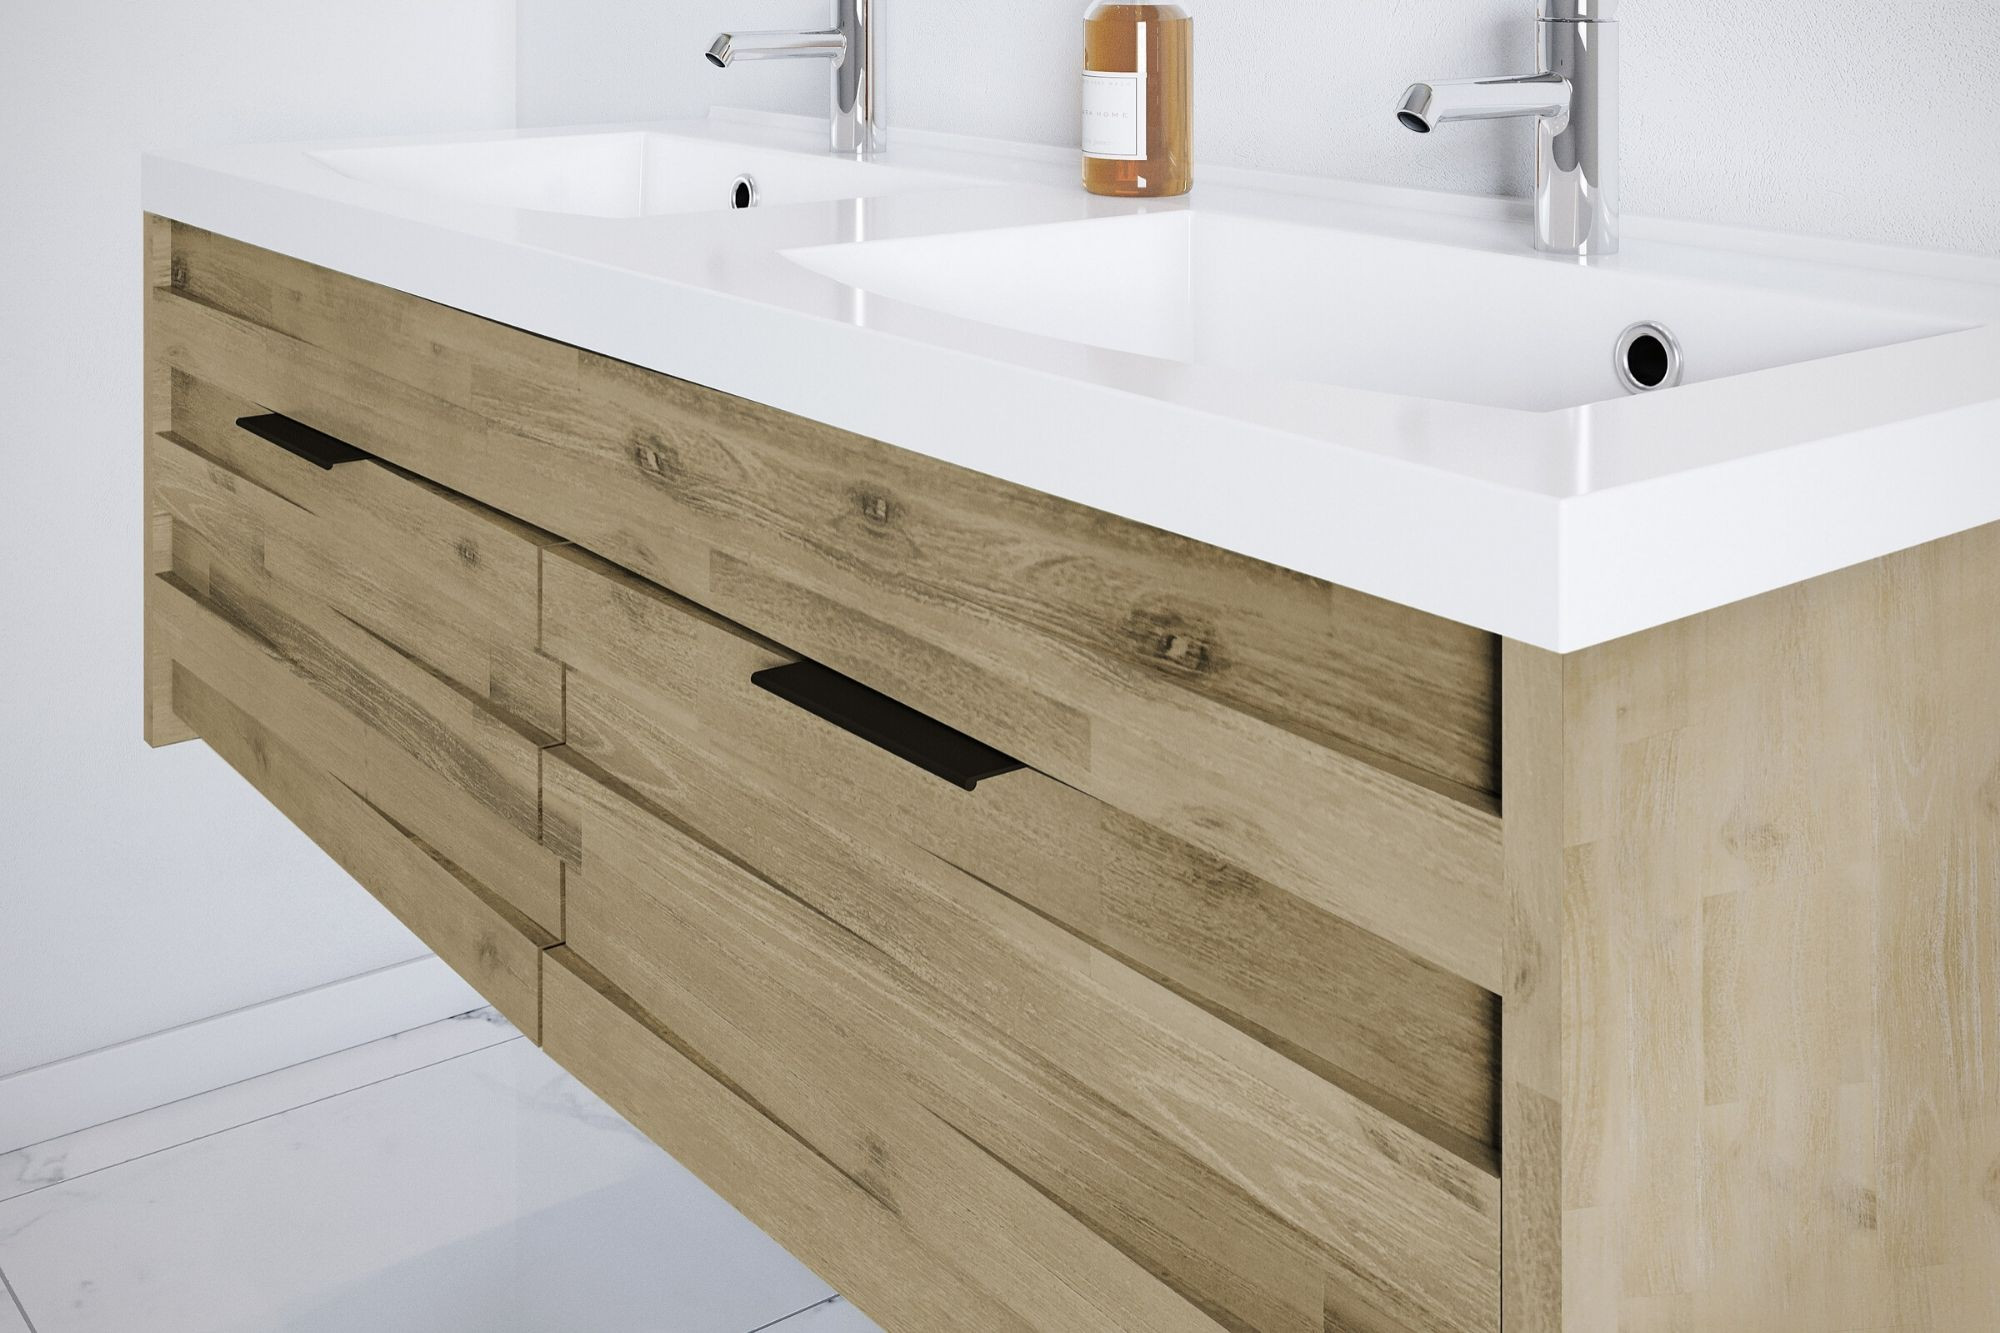 Meuble de salle de bain 16 cm en bois massif et sa double vasque - Hellin